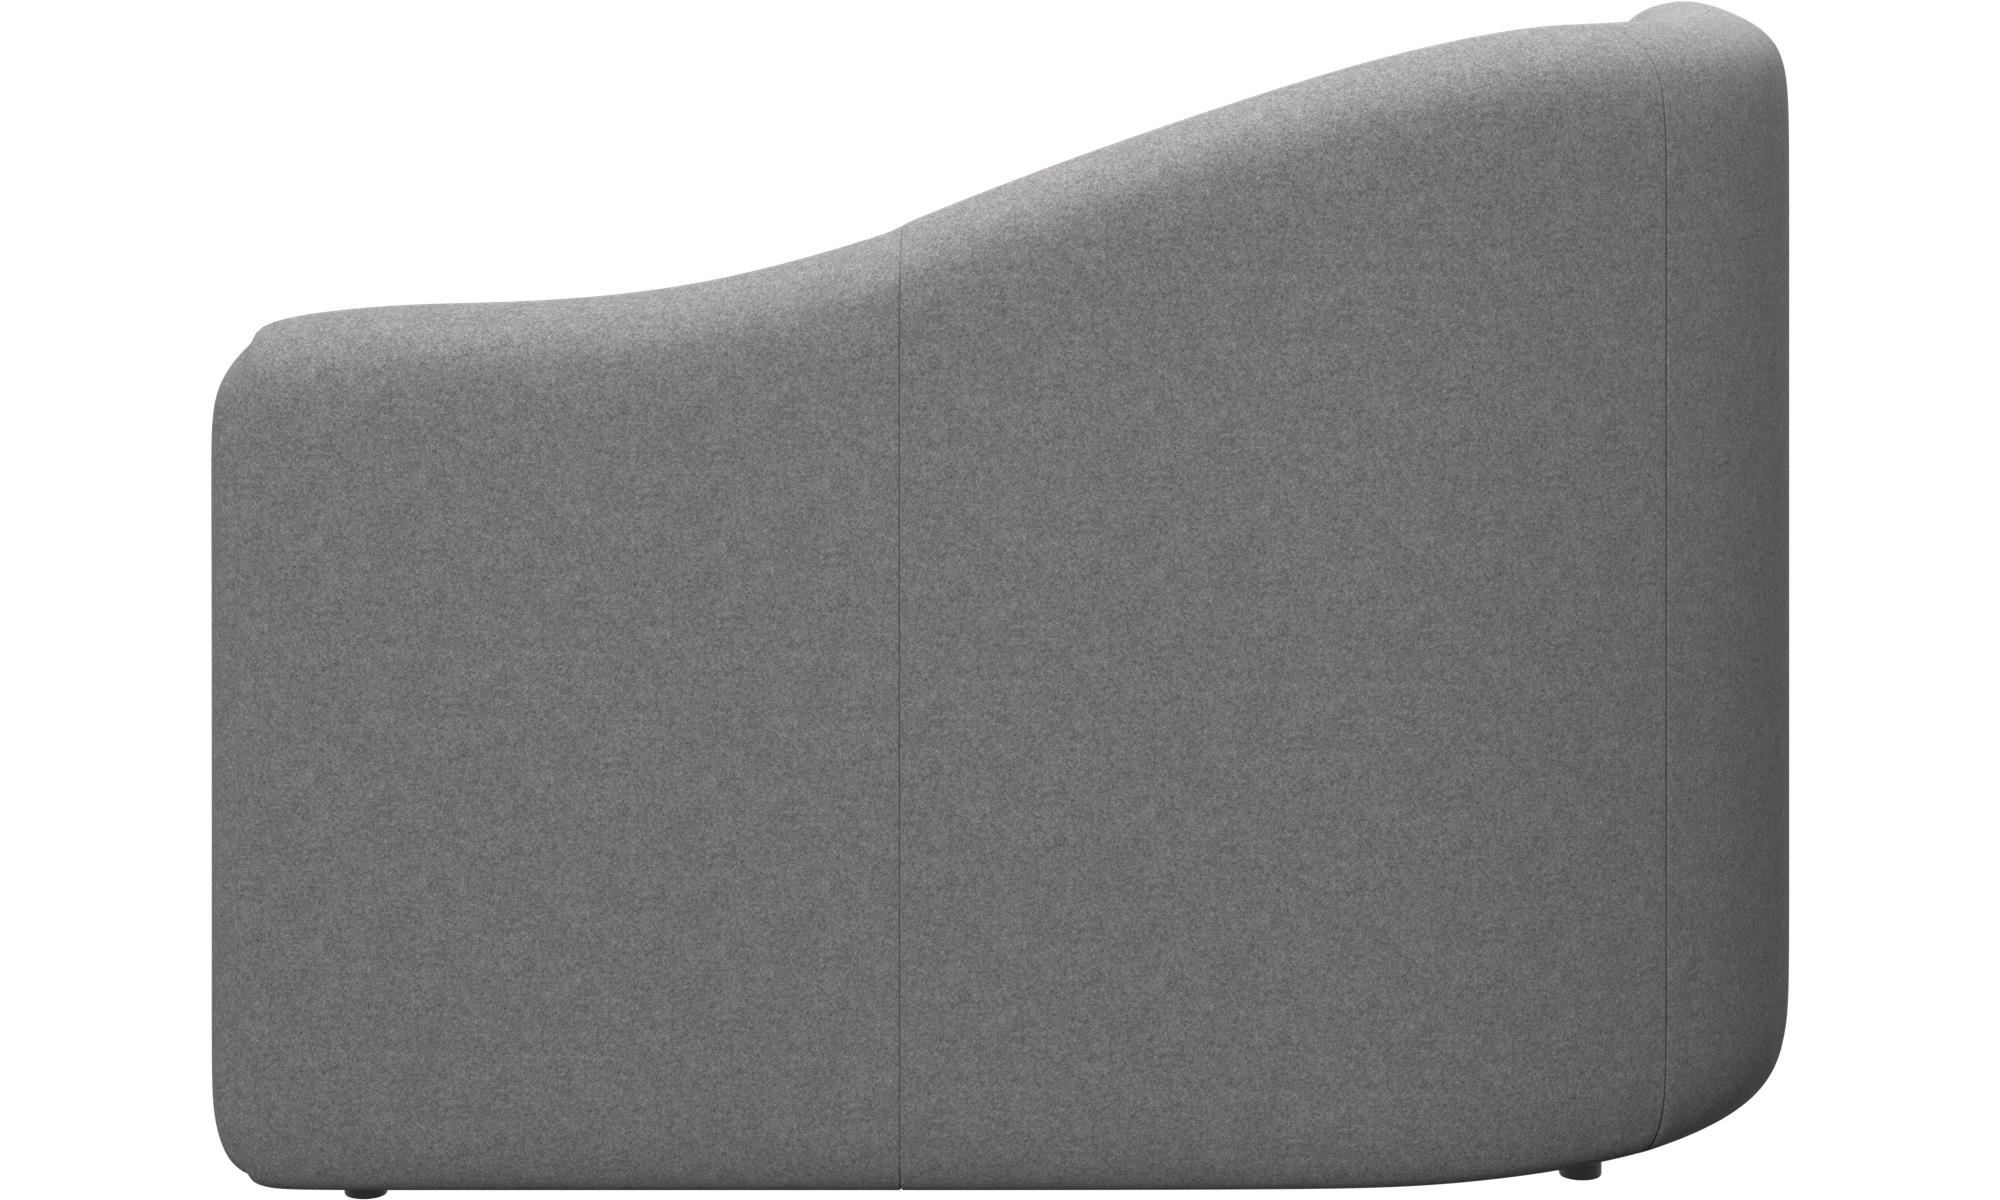 Modulare Sofas - Ottawa 1,5-Sitzer rechte Armlehne - BoConcept